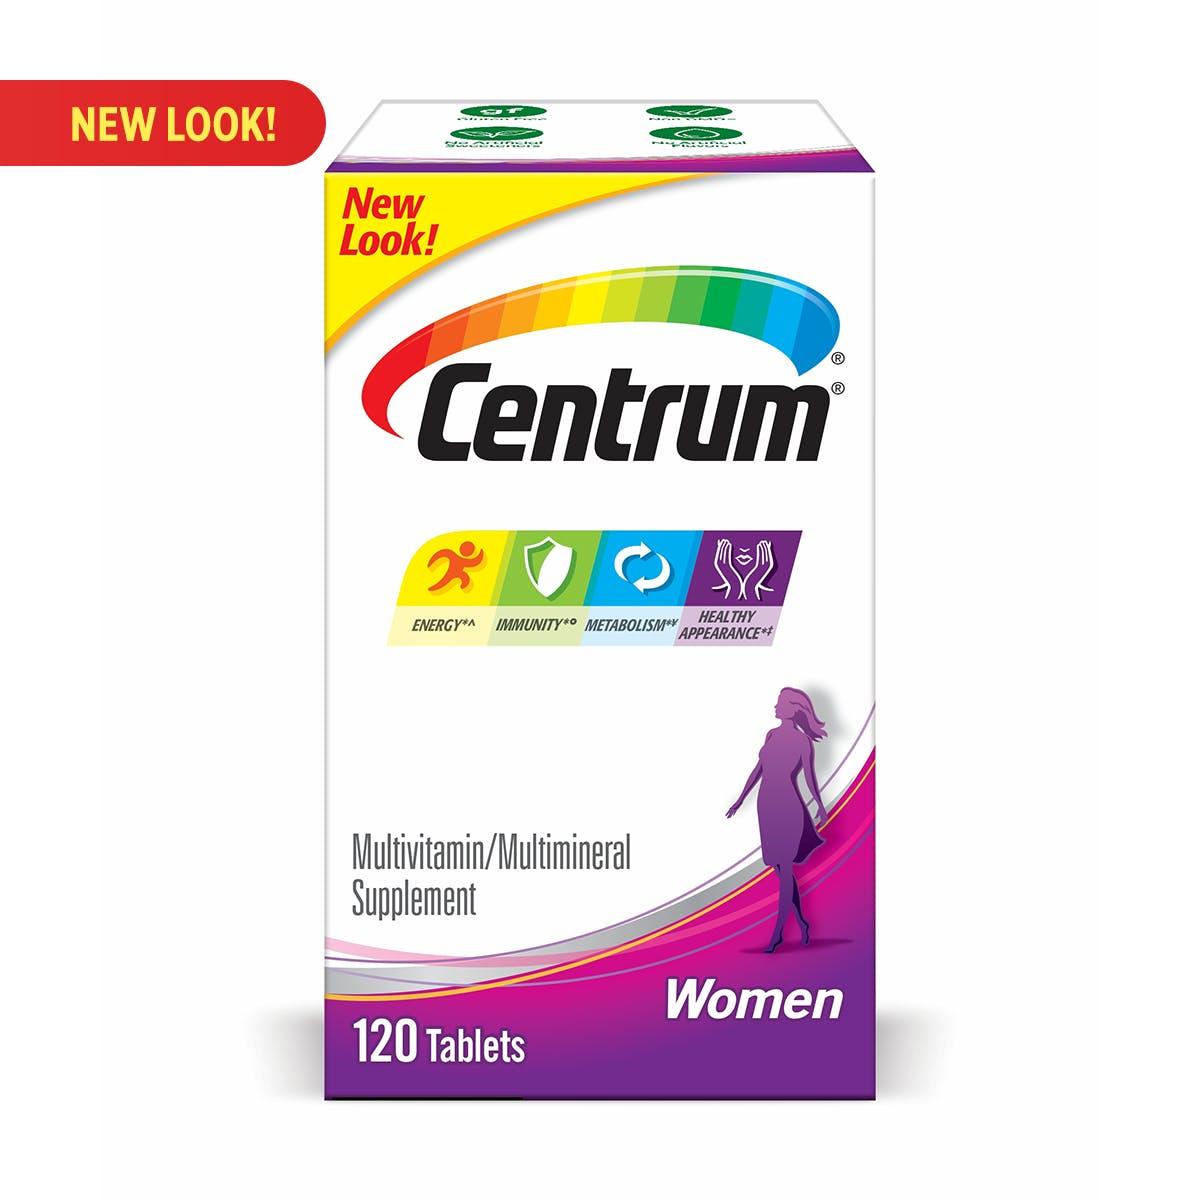 Box of Centrum Women multivitamins